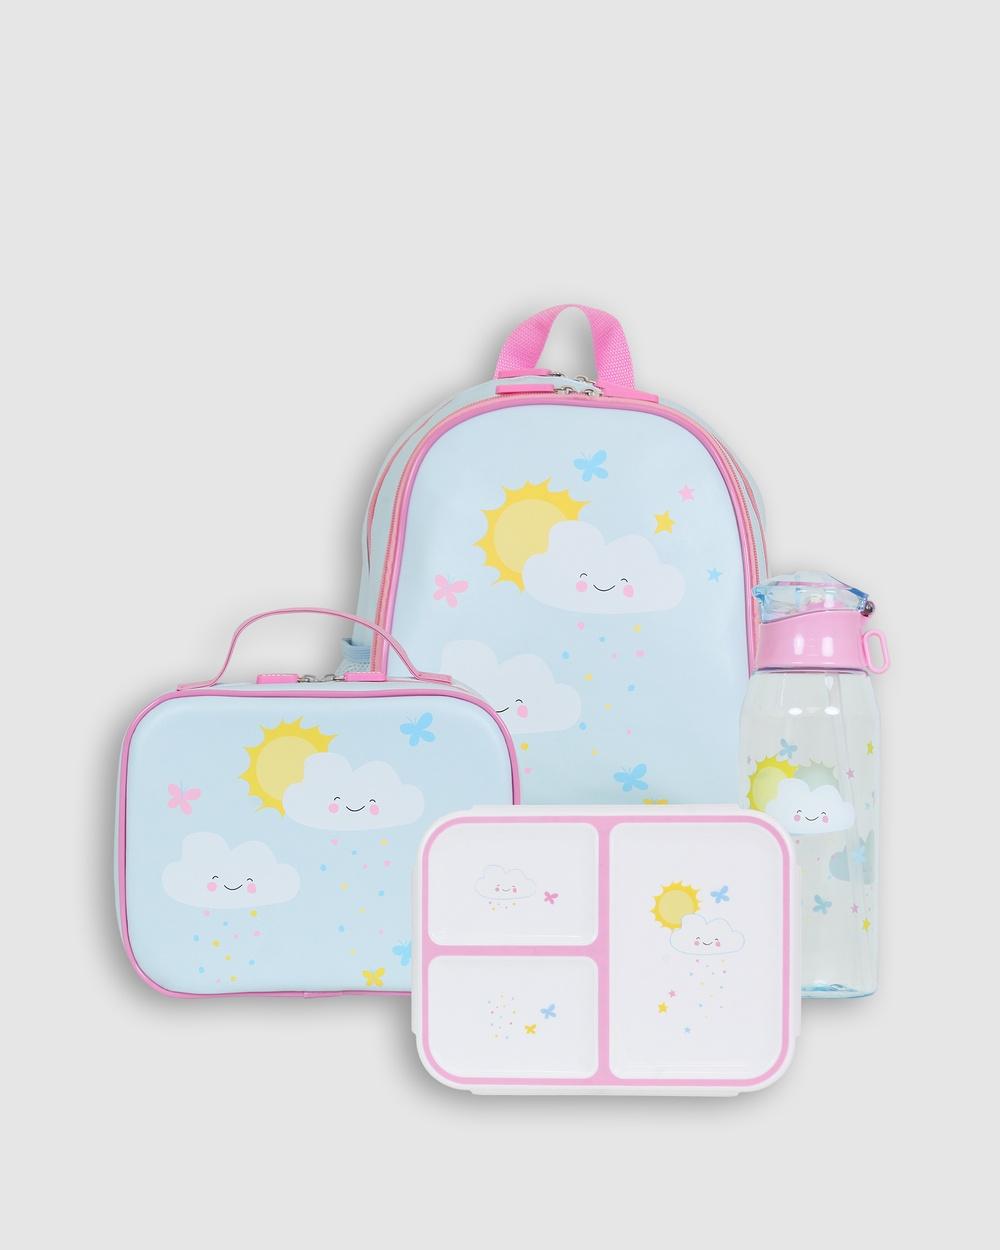 Bobbleart Large Backpack Lunch Bag Bento Box and Drink Bottle Happy Clouds Backpacks Light Blue